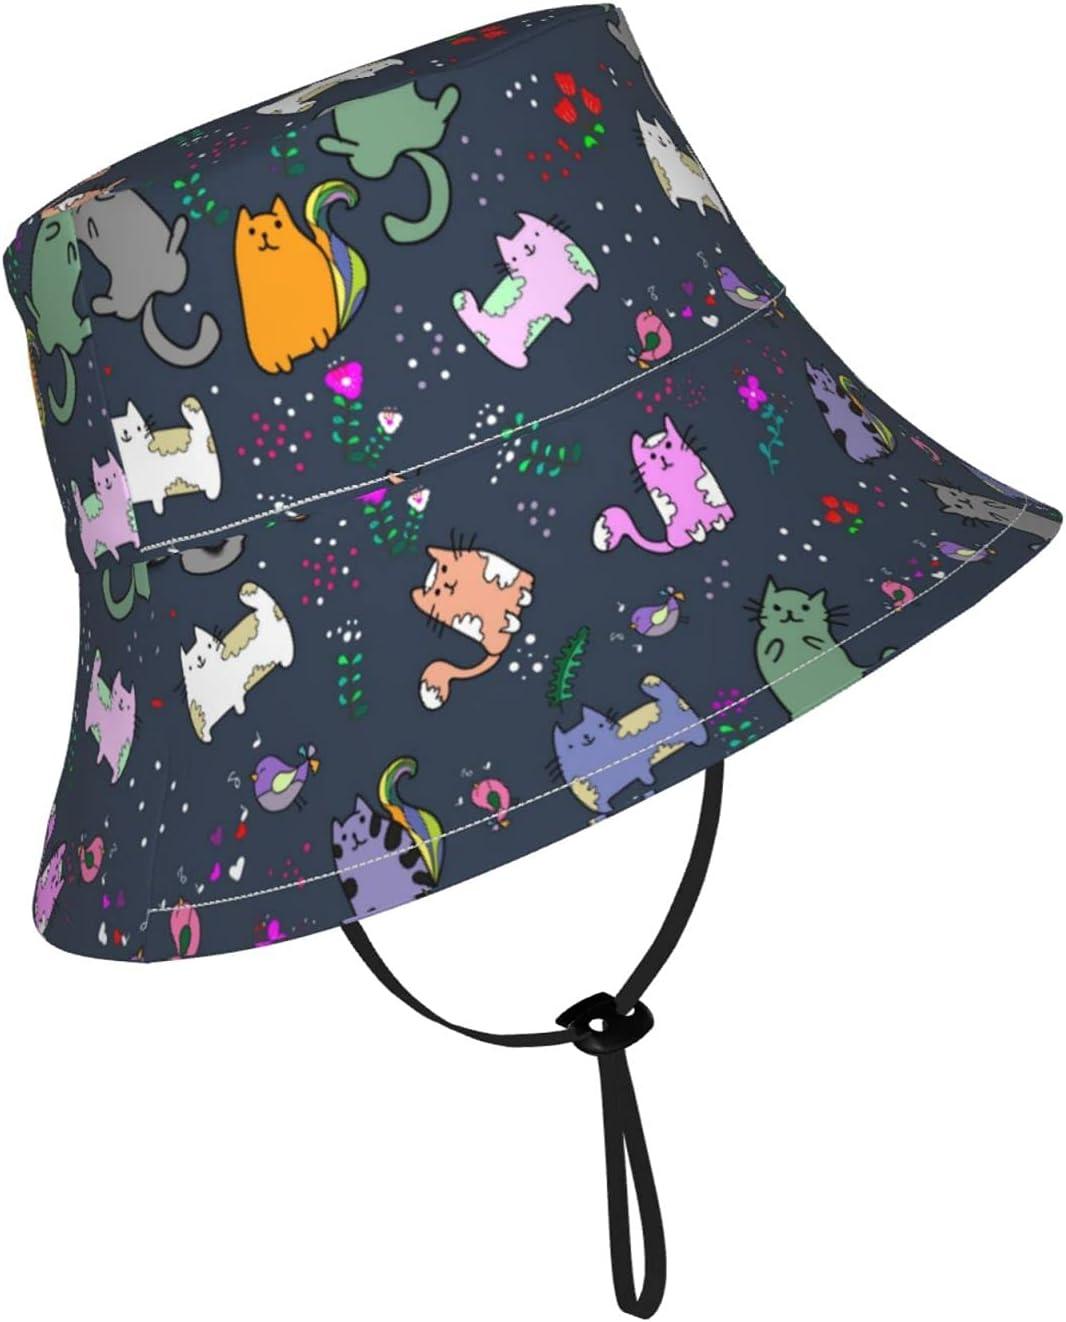 Jsragt Cute Cat with Little Bird Miami Mall Sun Adjusta 5% OFF Hat Kids Breathable